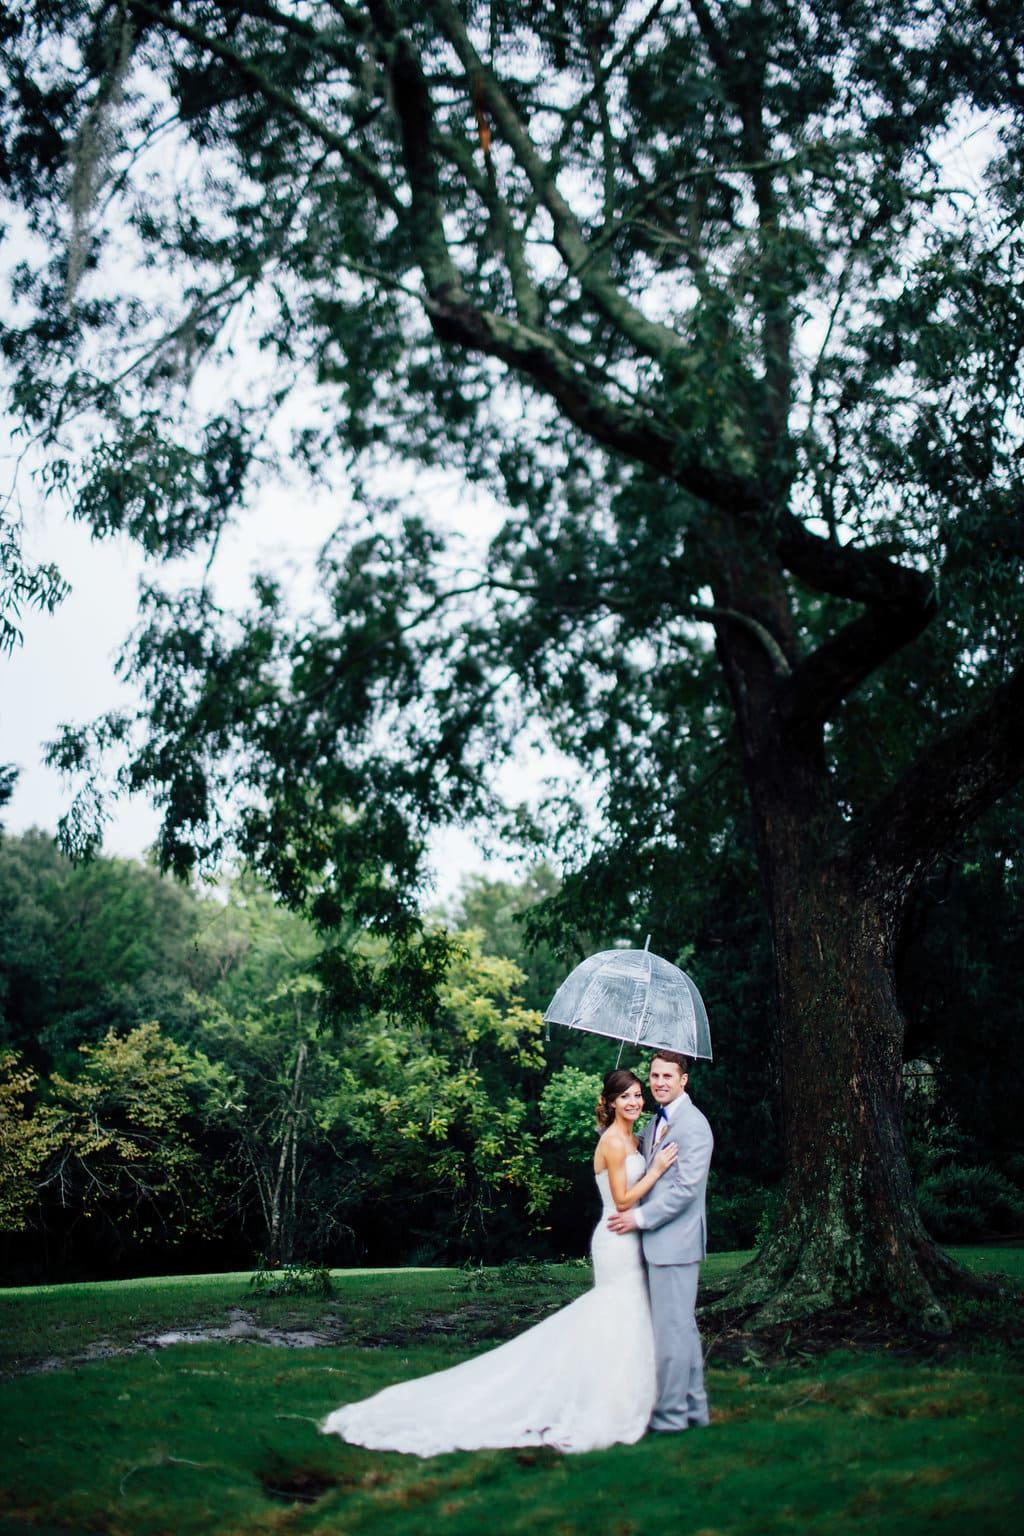 Hannah Lane Photography - Bad Weather